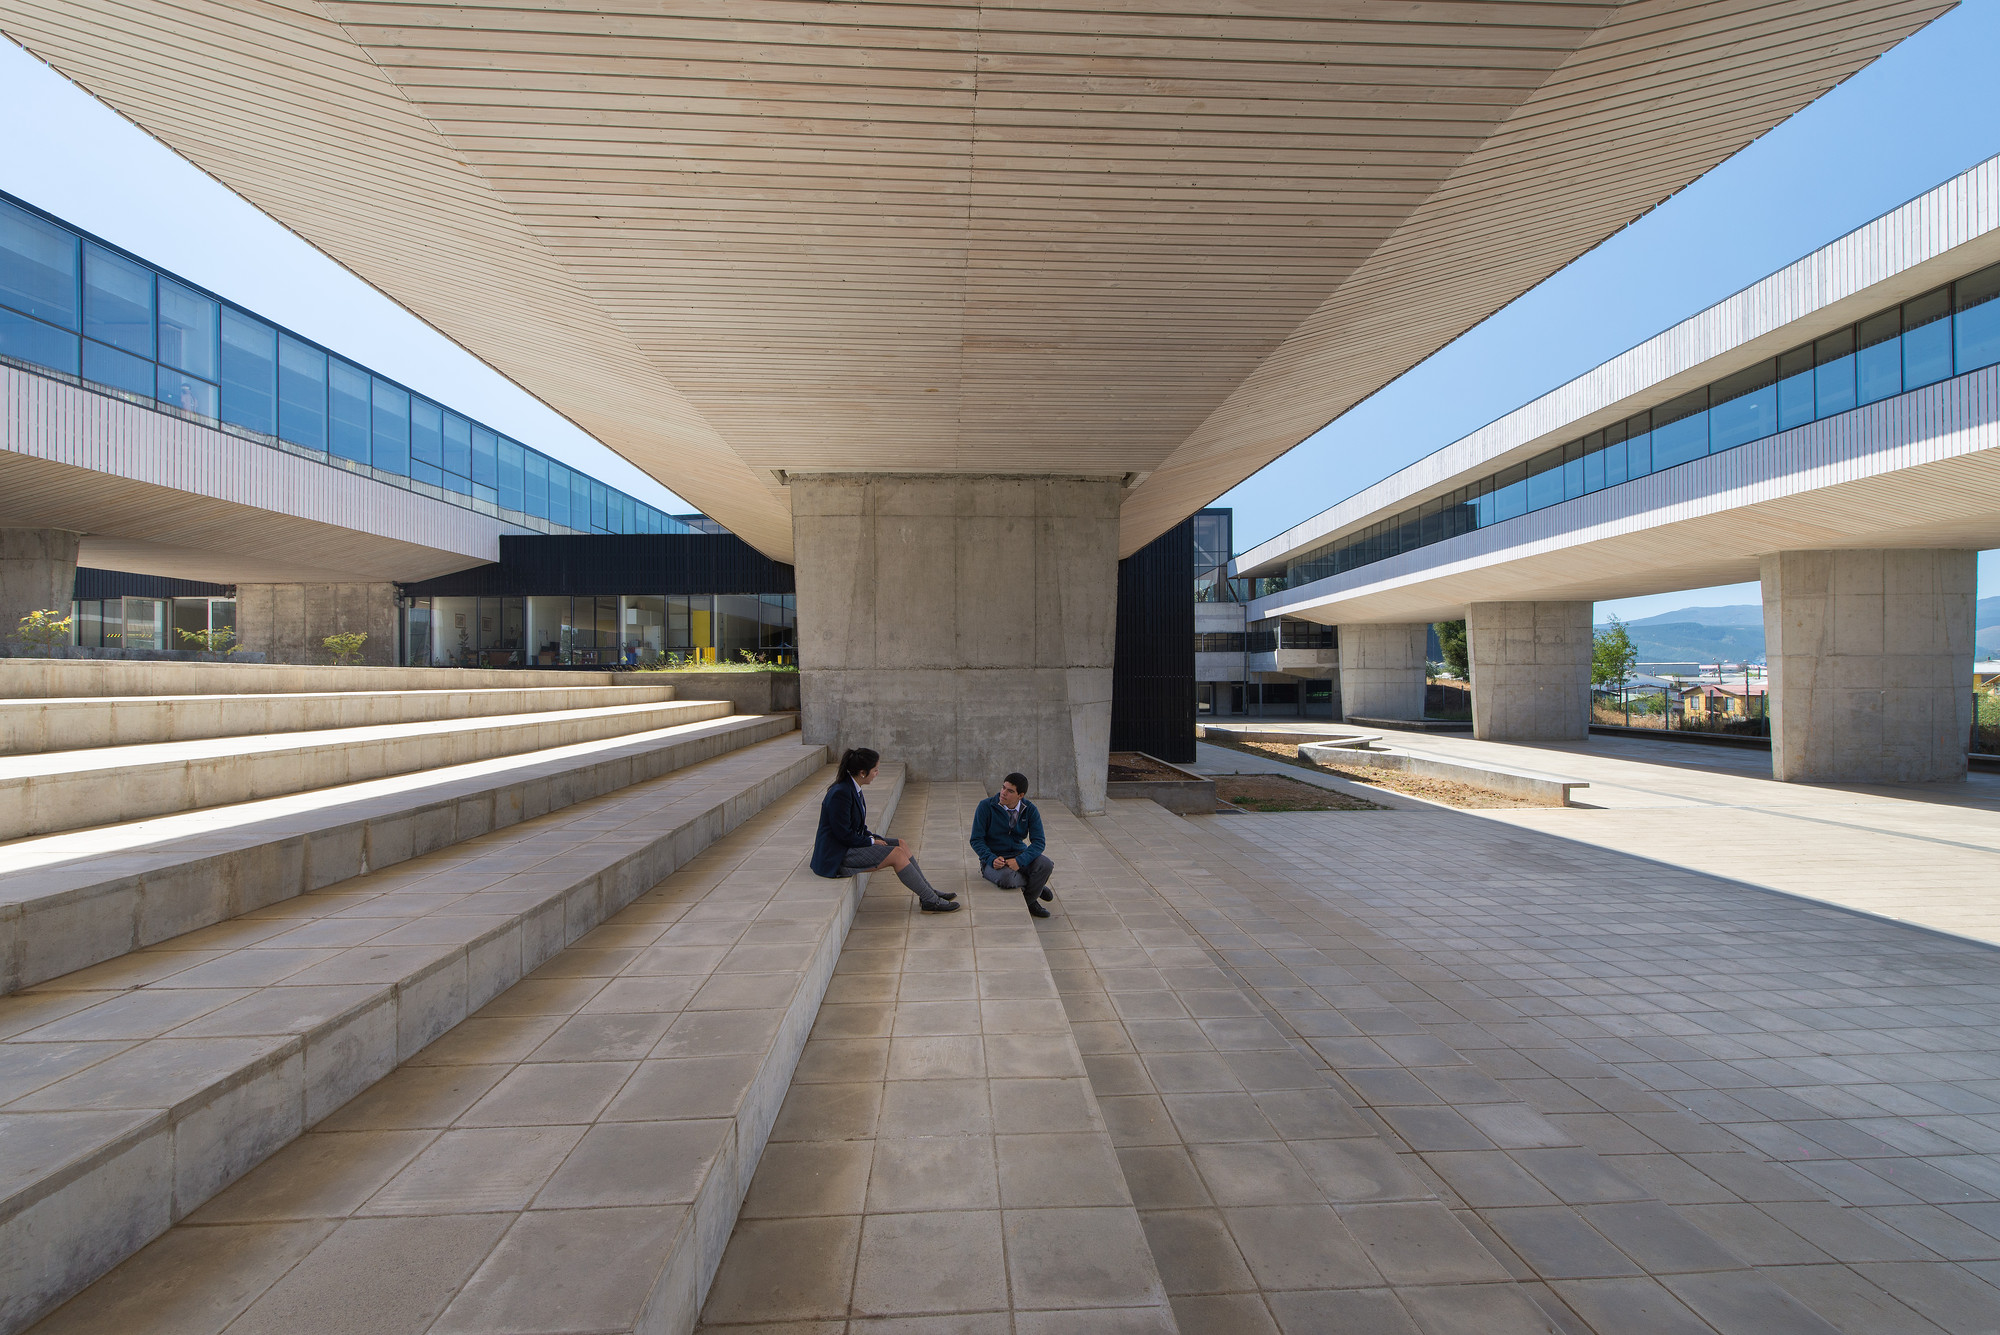 Liceo Mariano Latorre / Macchi - Jeame - Danus  & Boza - Boza - Labbé - Ruiz Risueño, © Felipe Díaz Contardo